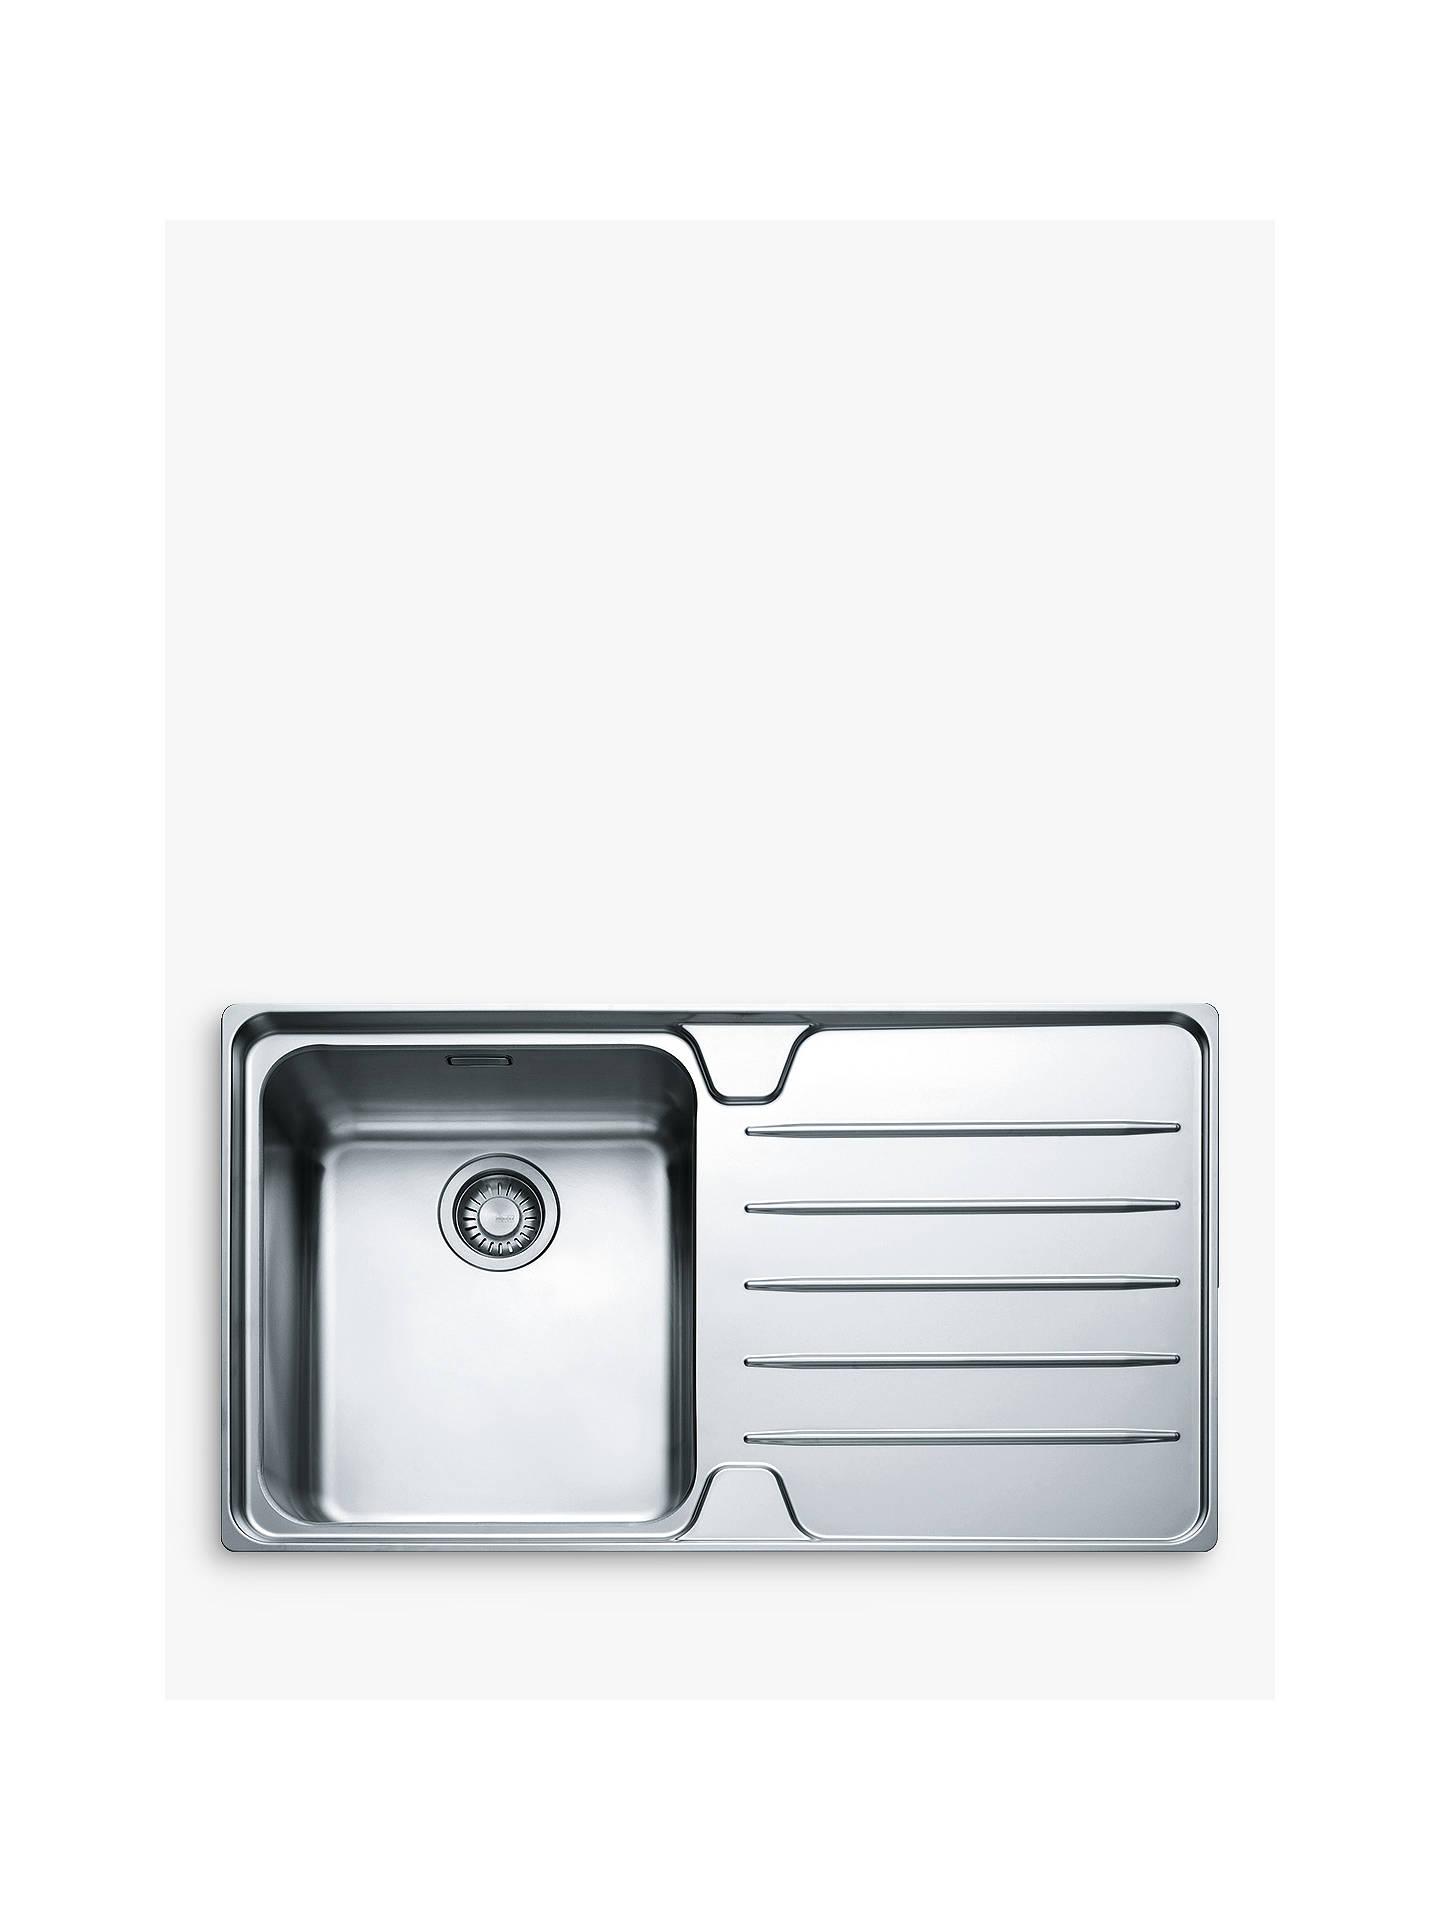 Stainless Steel 1.0 Kitchen Sink Free Waste Kit Precision Plus 100 Brand New